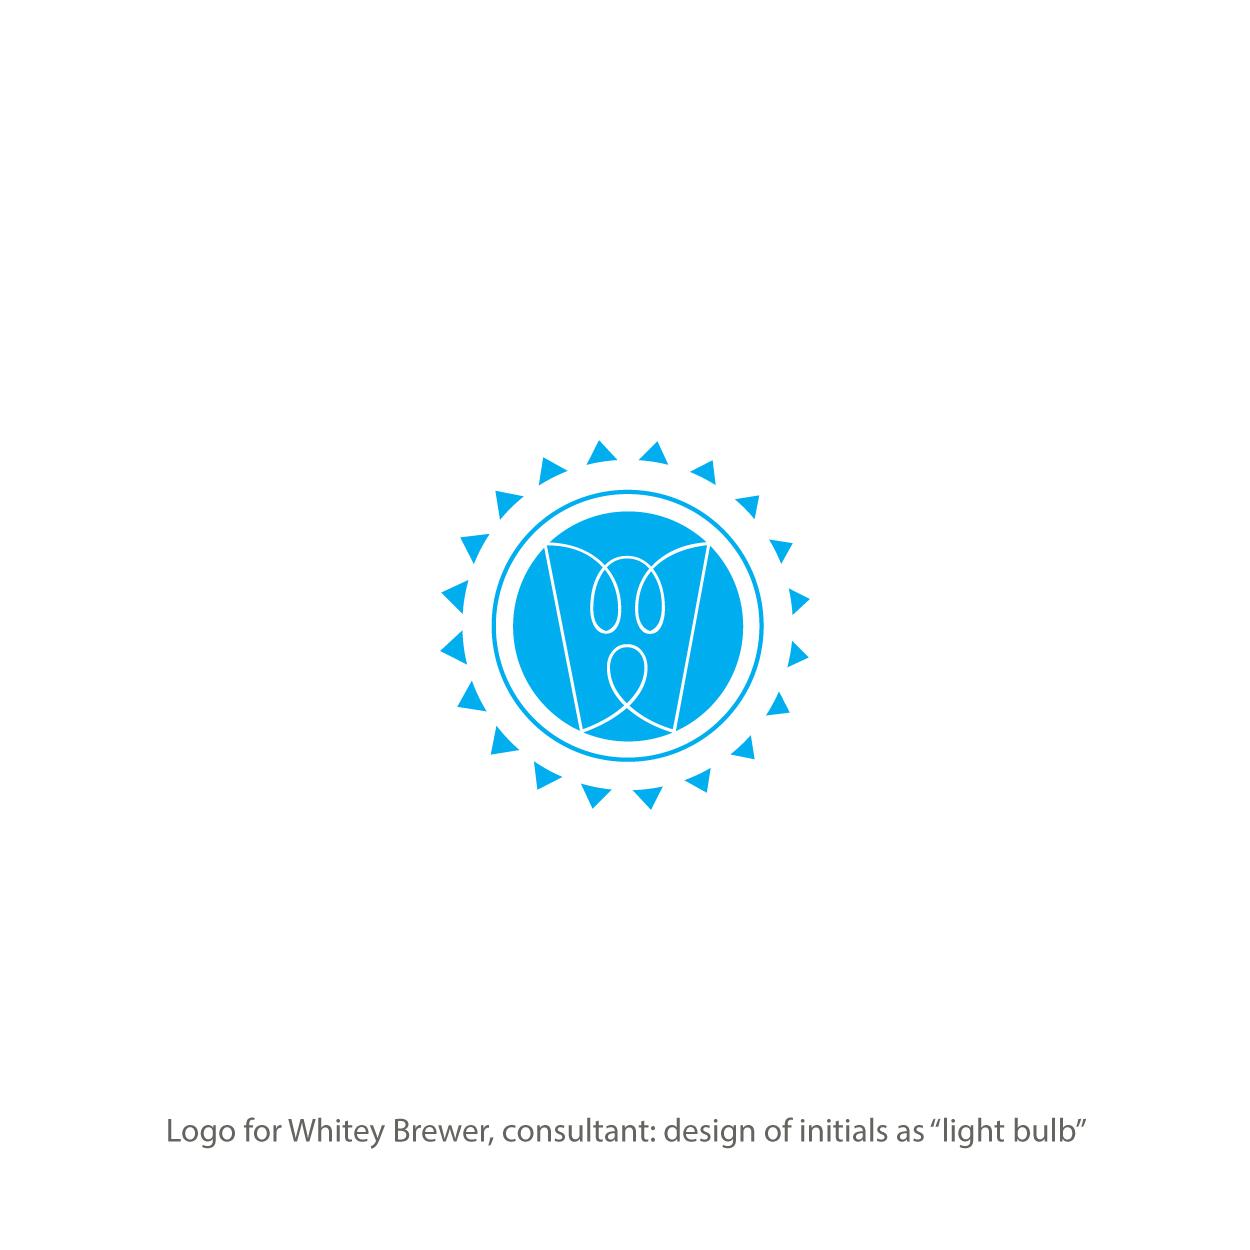 tjungle_design_logos-30.jpg